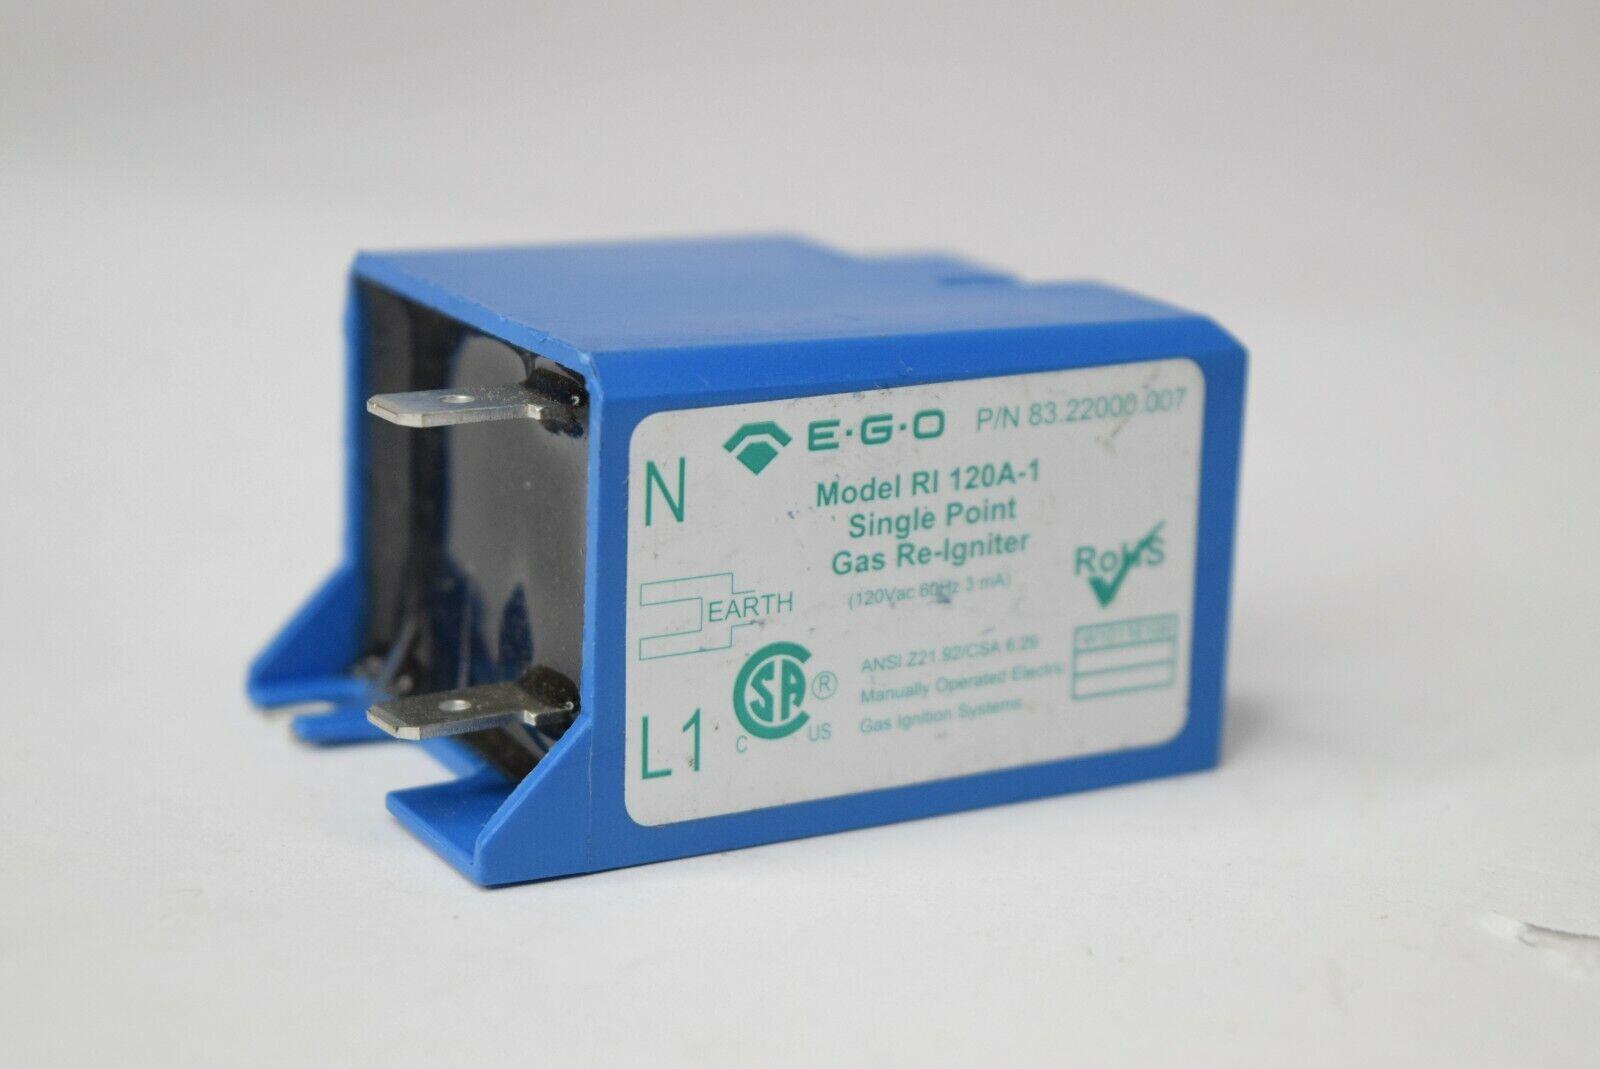 EGO 83.22000.007 RI 120A-1 Single Point Gas ReIgniter Igniter Spark Module 120v